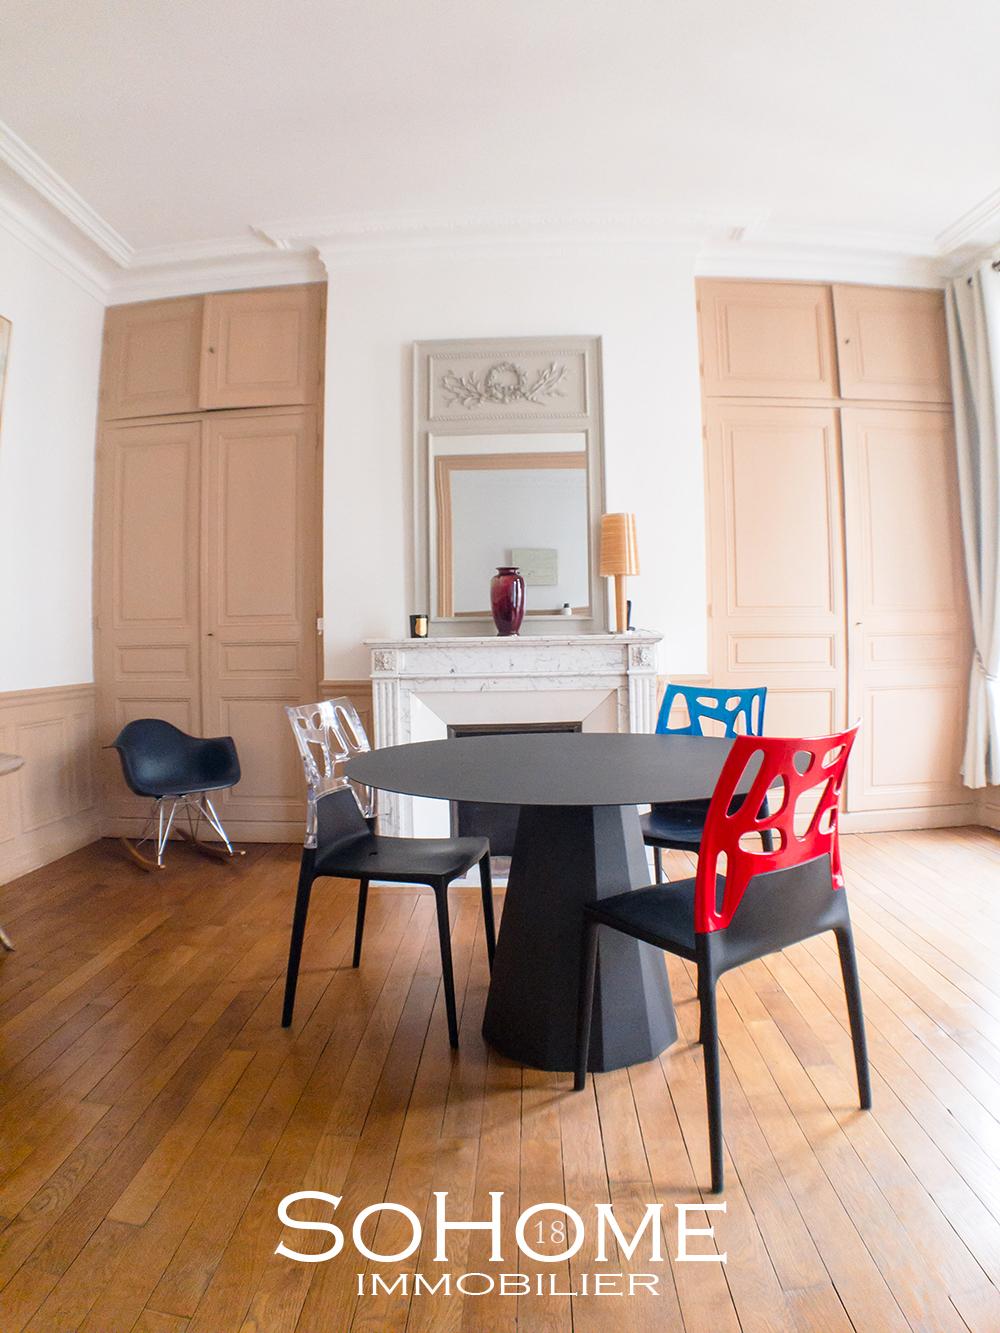 SoHome-LELEGANT-Appartement-1.jpg